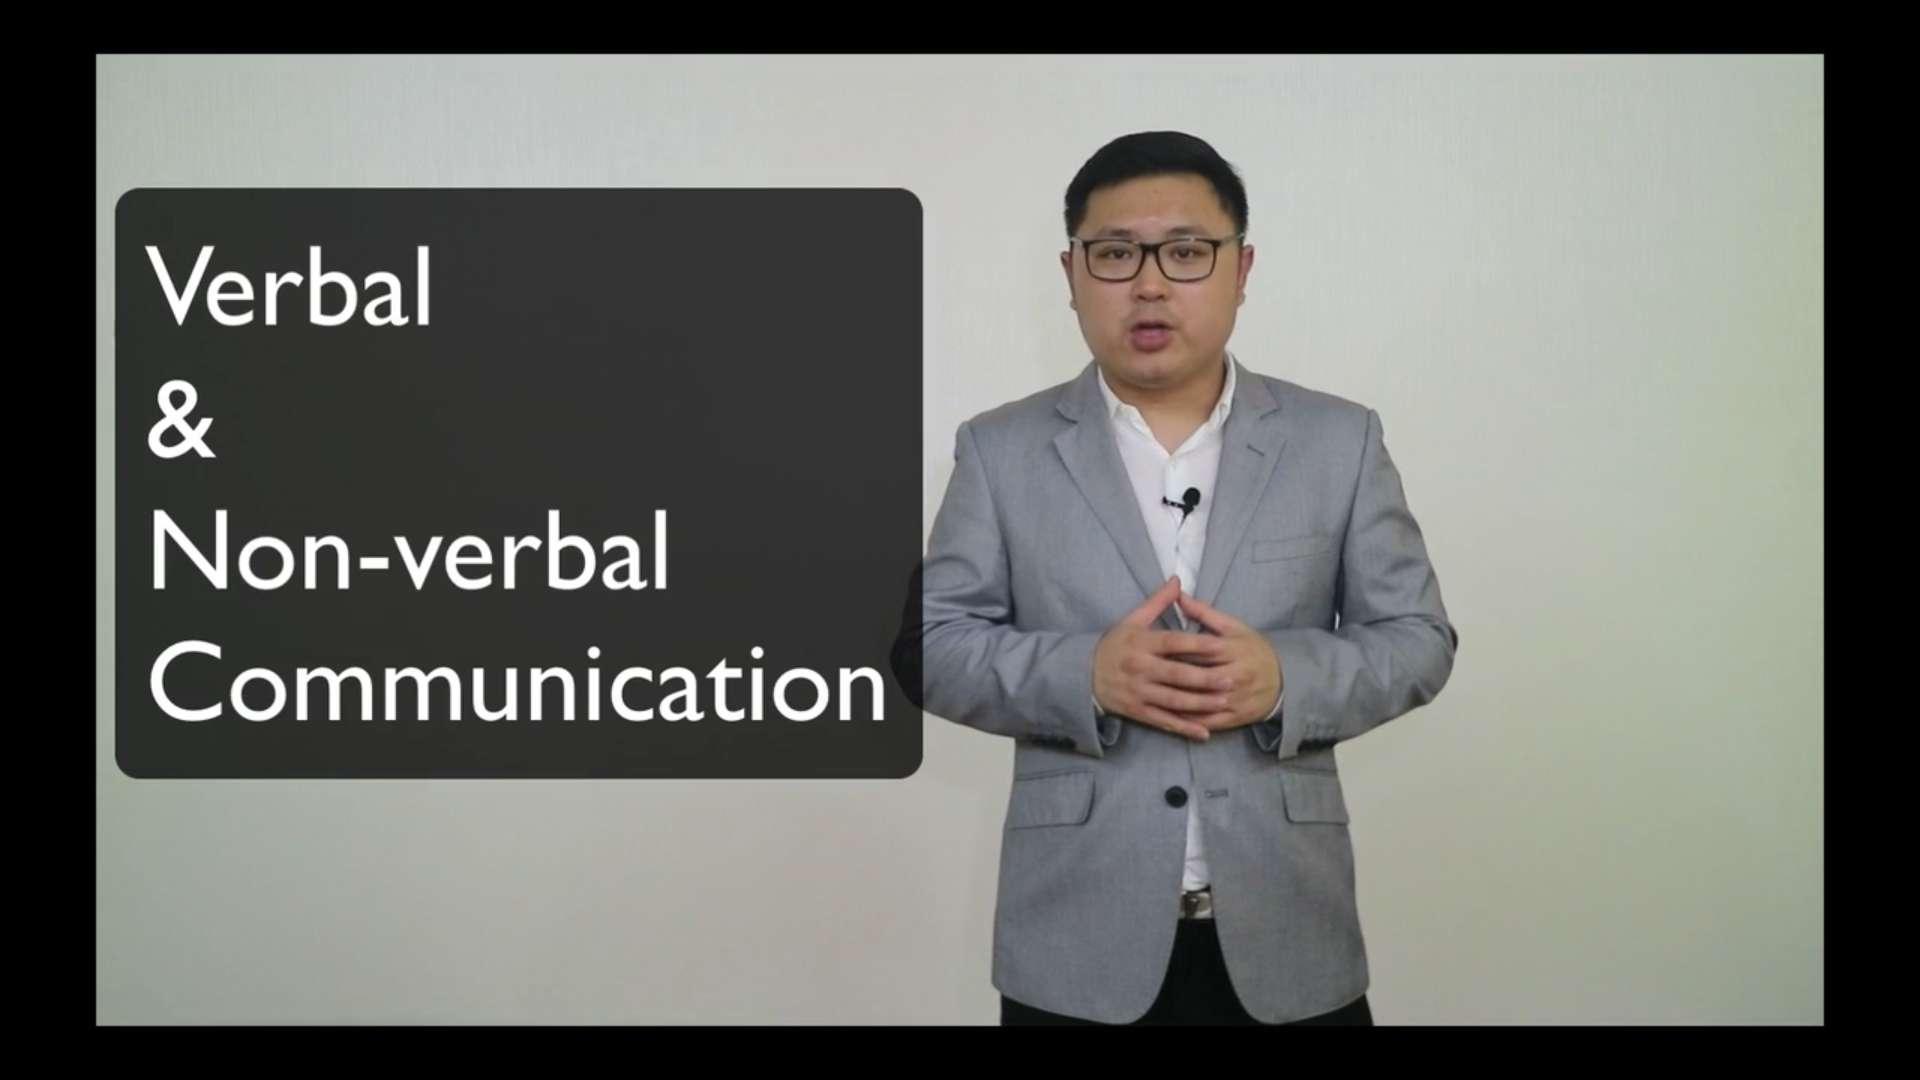 8. Verbal & Non-verbal communication